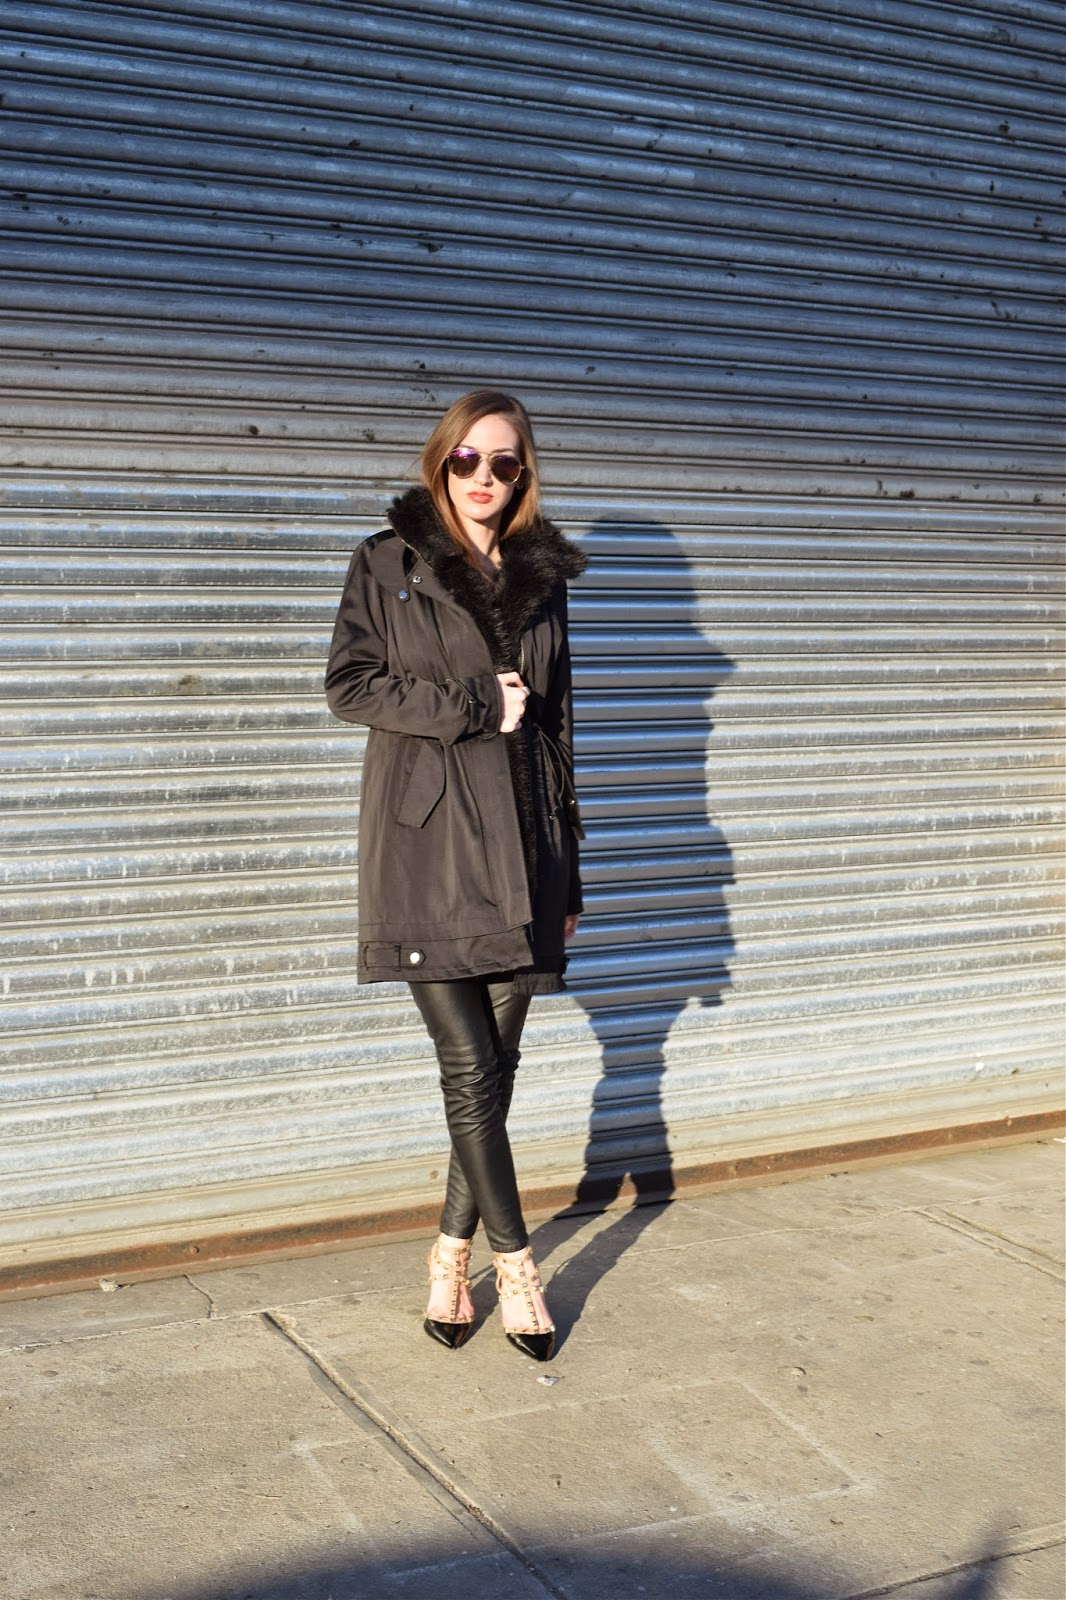 Black on black look, all black outfit with heels, bcbg darron heels